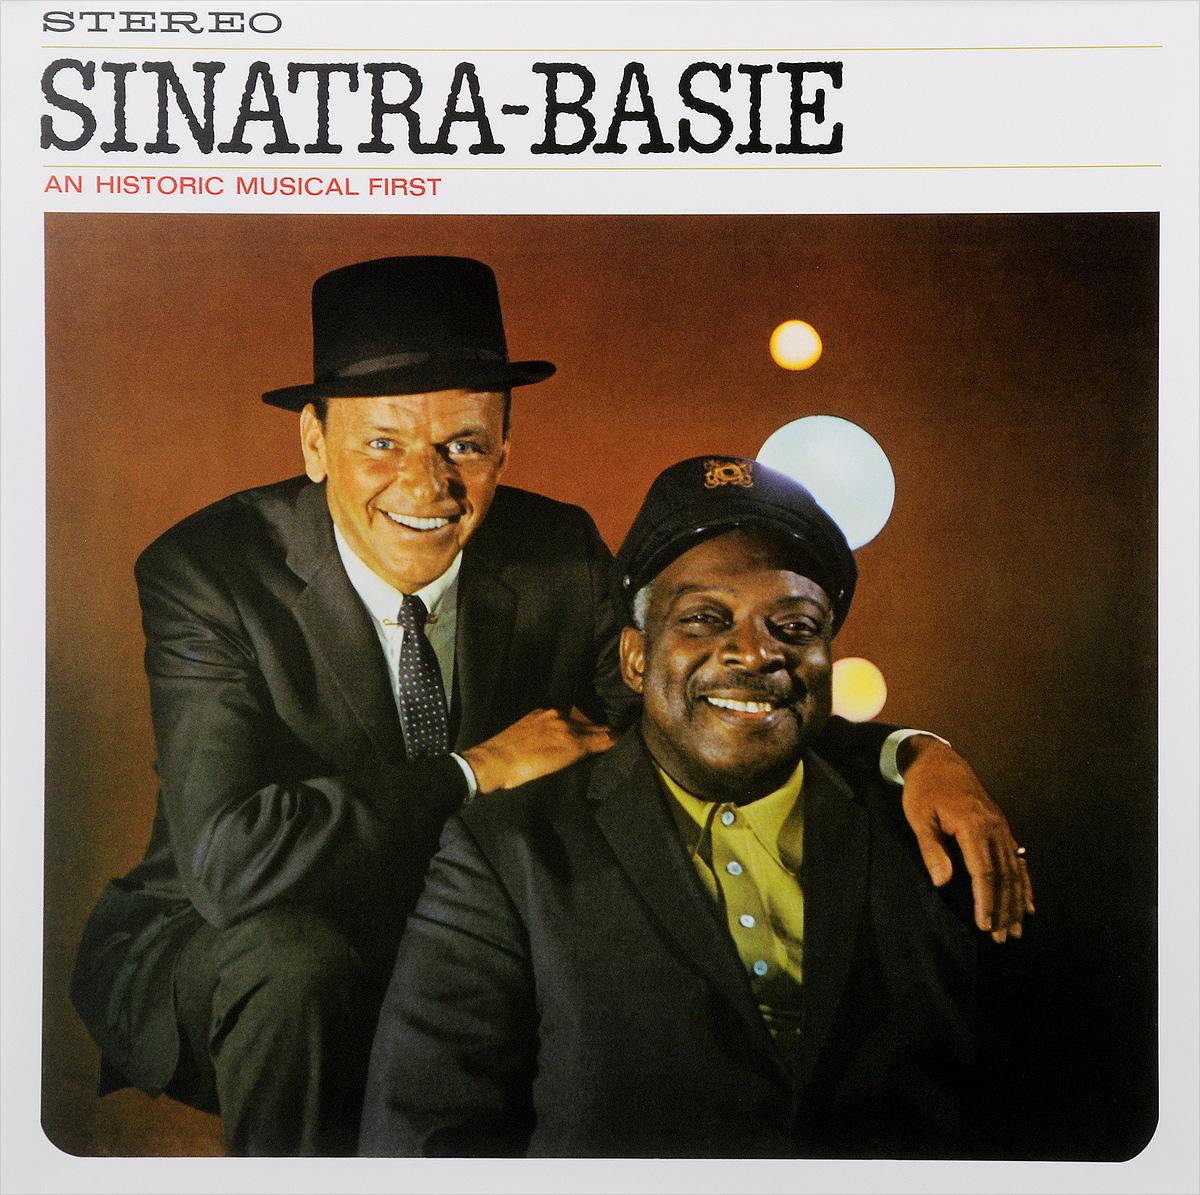 Фрэнк Синатра,Каунт Бэйси Sinatra, Basie. An Historic Musical First (LP) каунт бэйси count basie four classic albums plus 2 cd